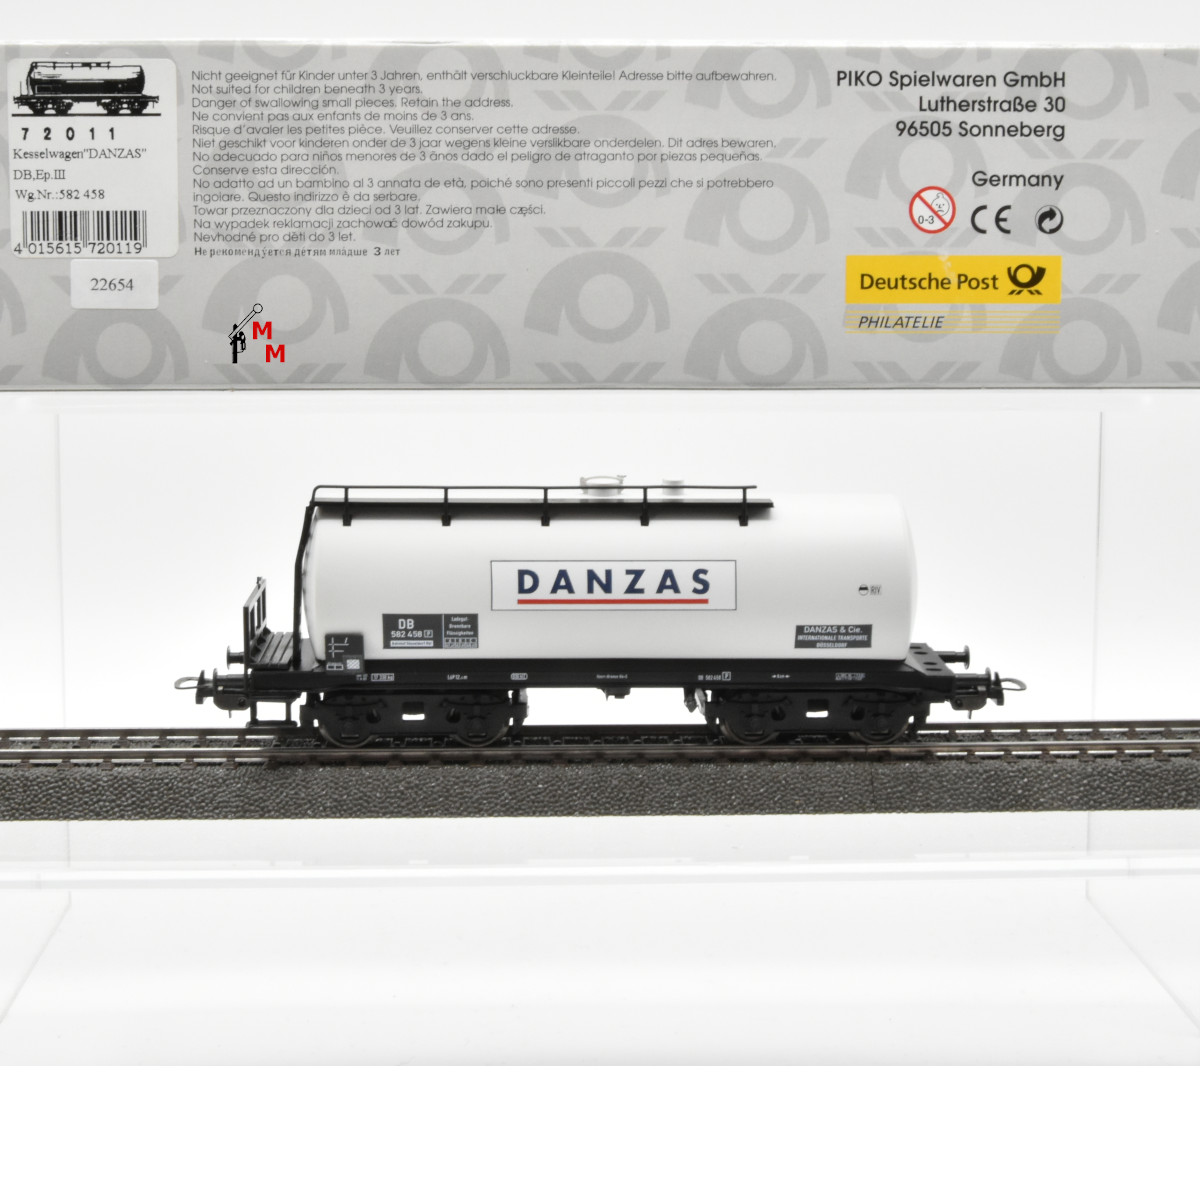 Piko 72011 Kesselwagen DANZAS Ep III, (22654)